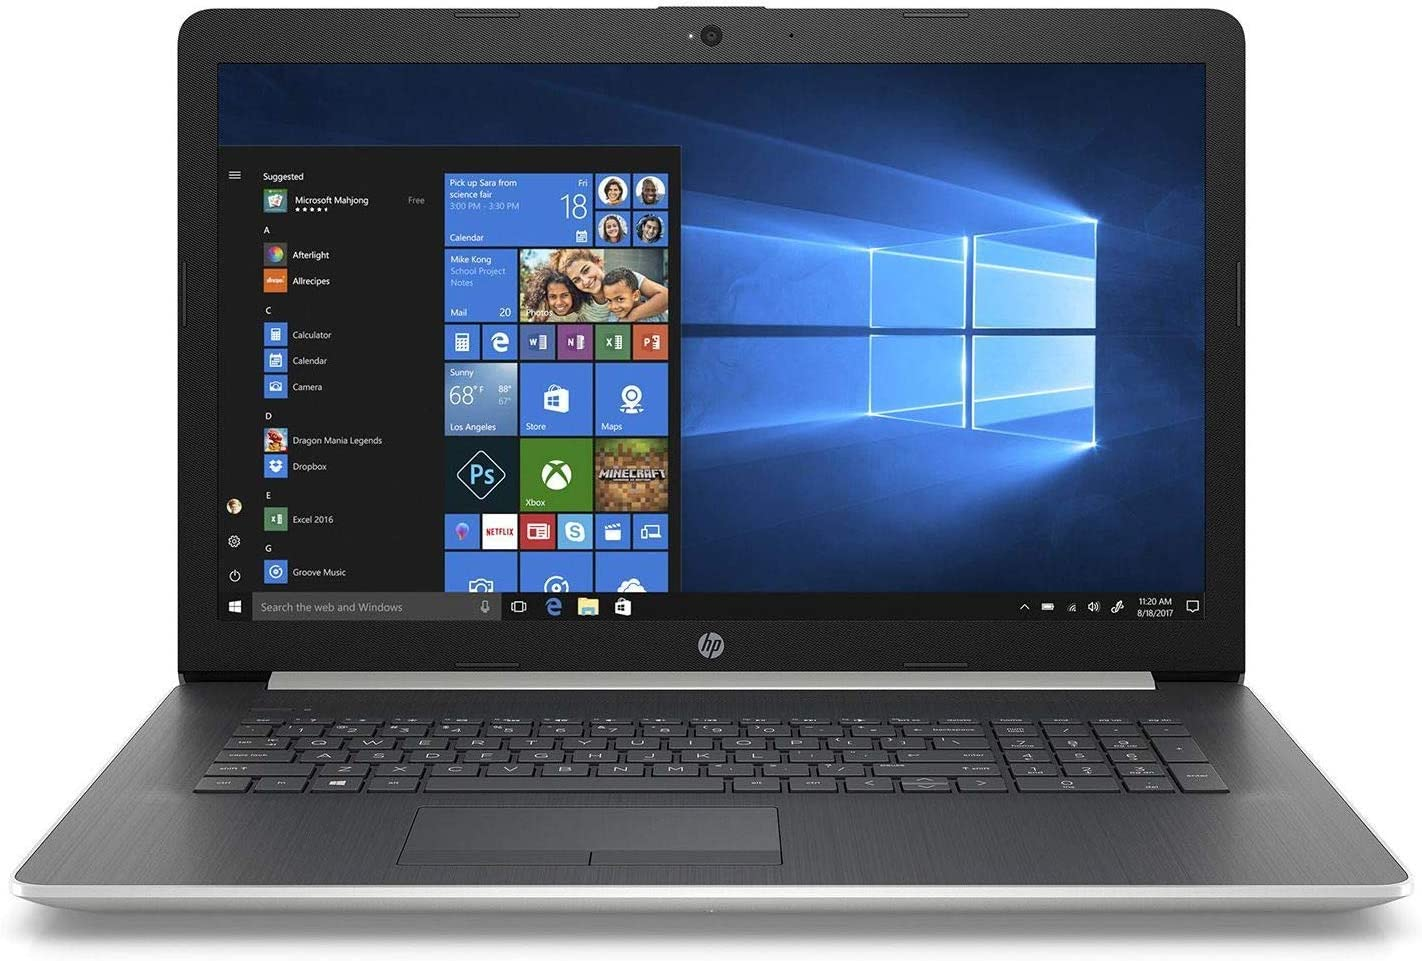 "HP 17.3"" HD+ SVA WLED-Backlit Notebook Laptop, Intel Core i5-8250U up to 3.4GHz, 24GB Memory: 16GB Intel Optane + 8GB DDR4, 2TB HDD, DVD, Webcam, Backlit Keyboard, Bluetooth, Windows 10 Home, Silver"